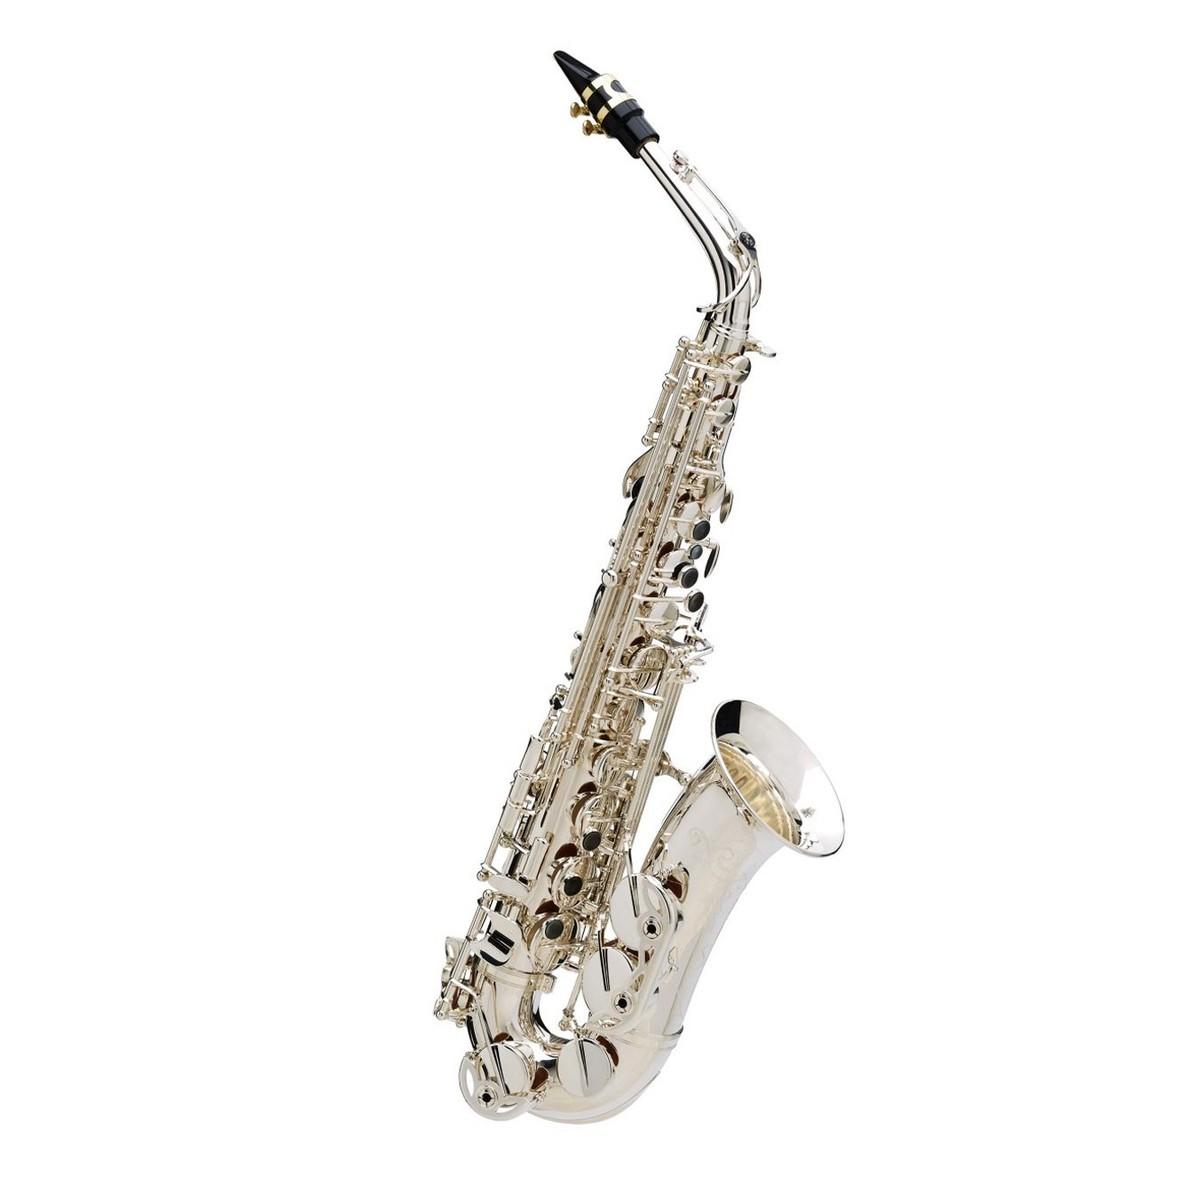 Astounding Buffet Senzo Alto Saxophone Silver Plated Copper Body Brass Keys Download Free Architecture Designs Ponolprimenicaraguapropertycom